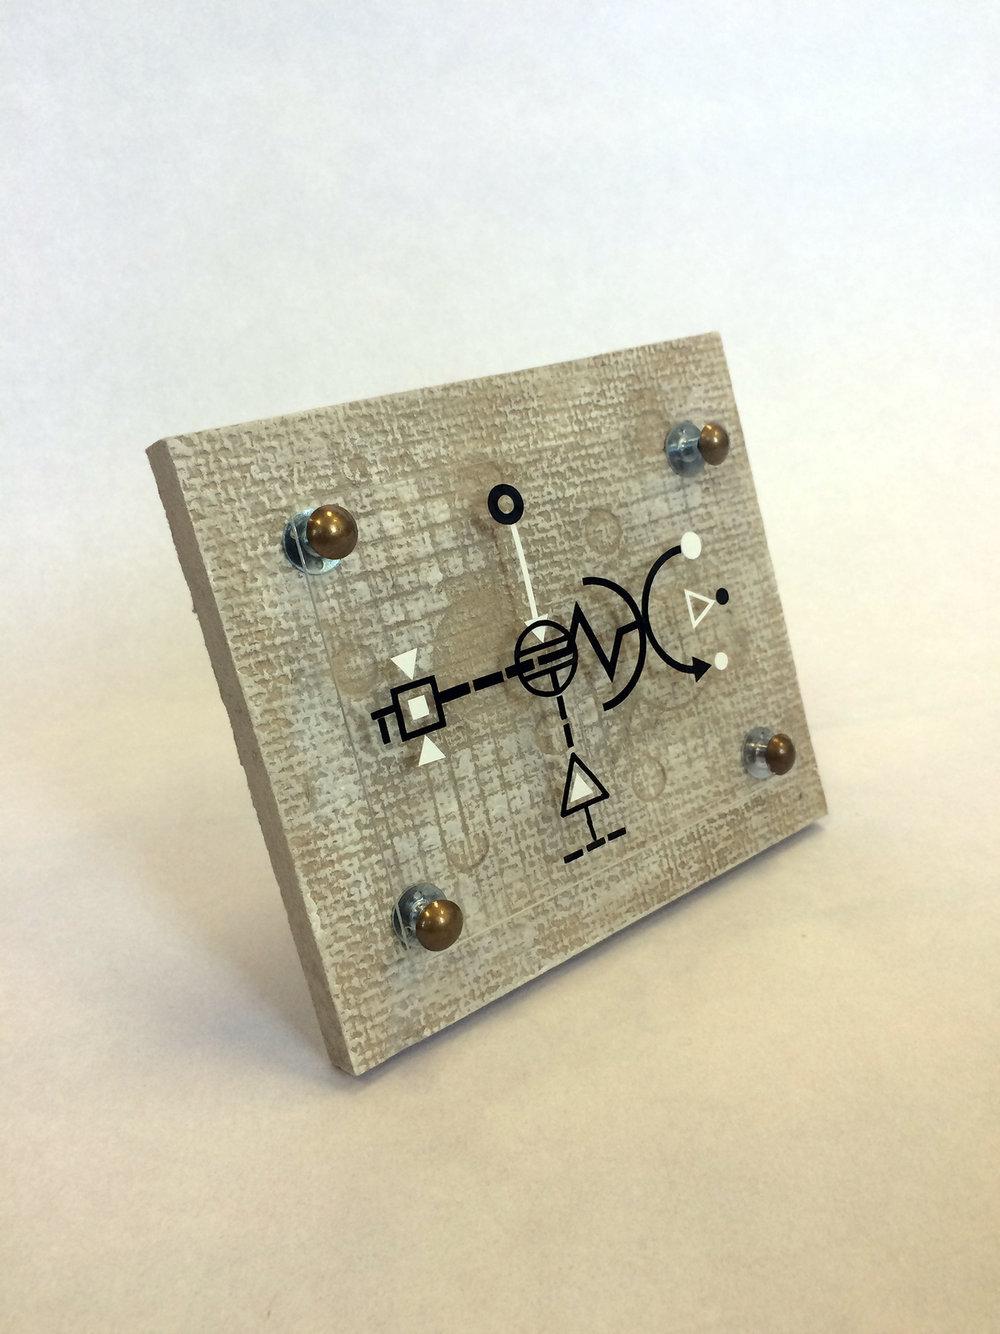 Instrument-Pysiograph-Diagrometer.jpg